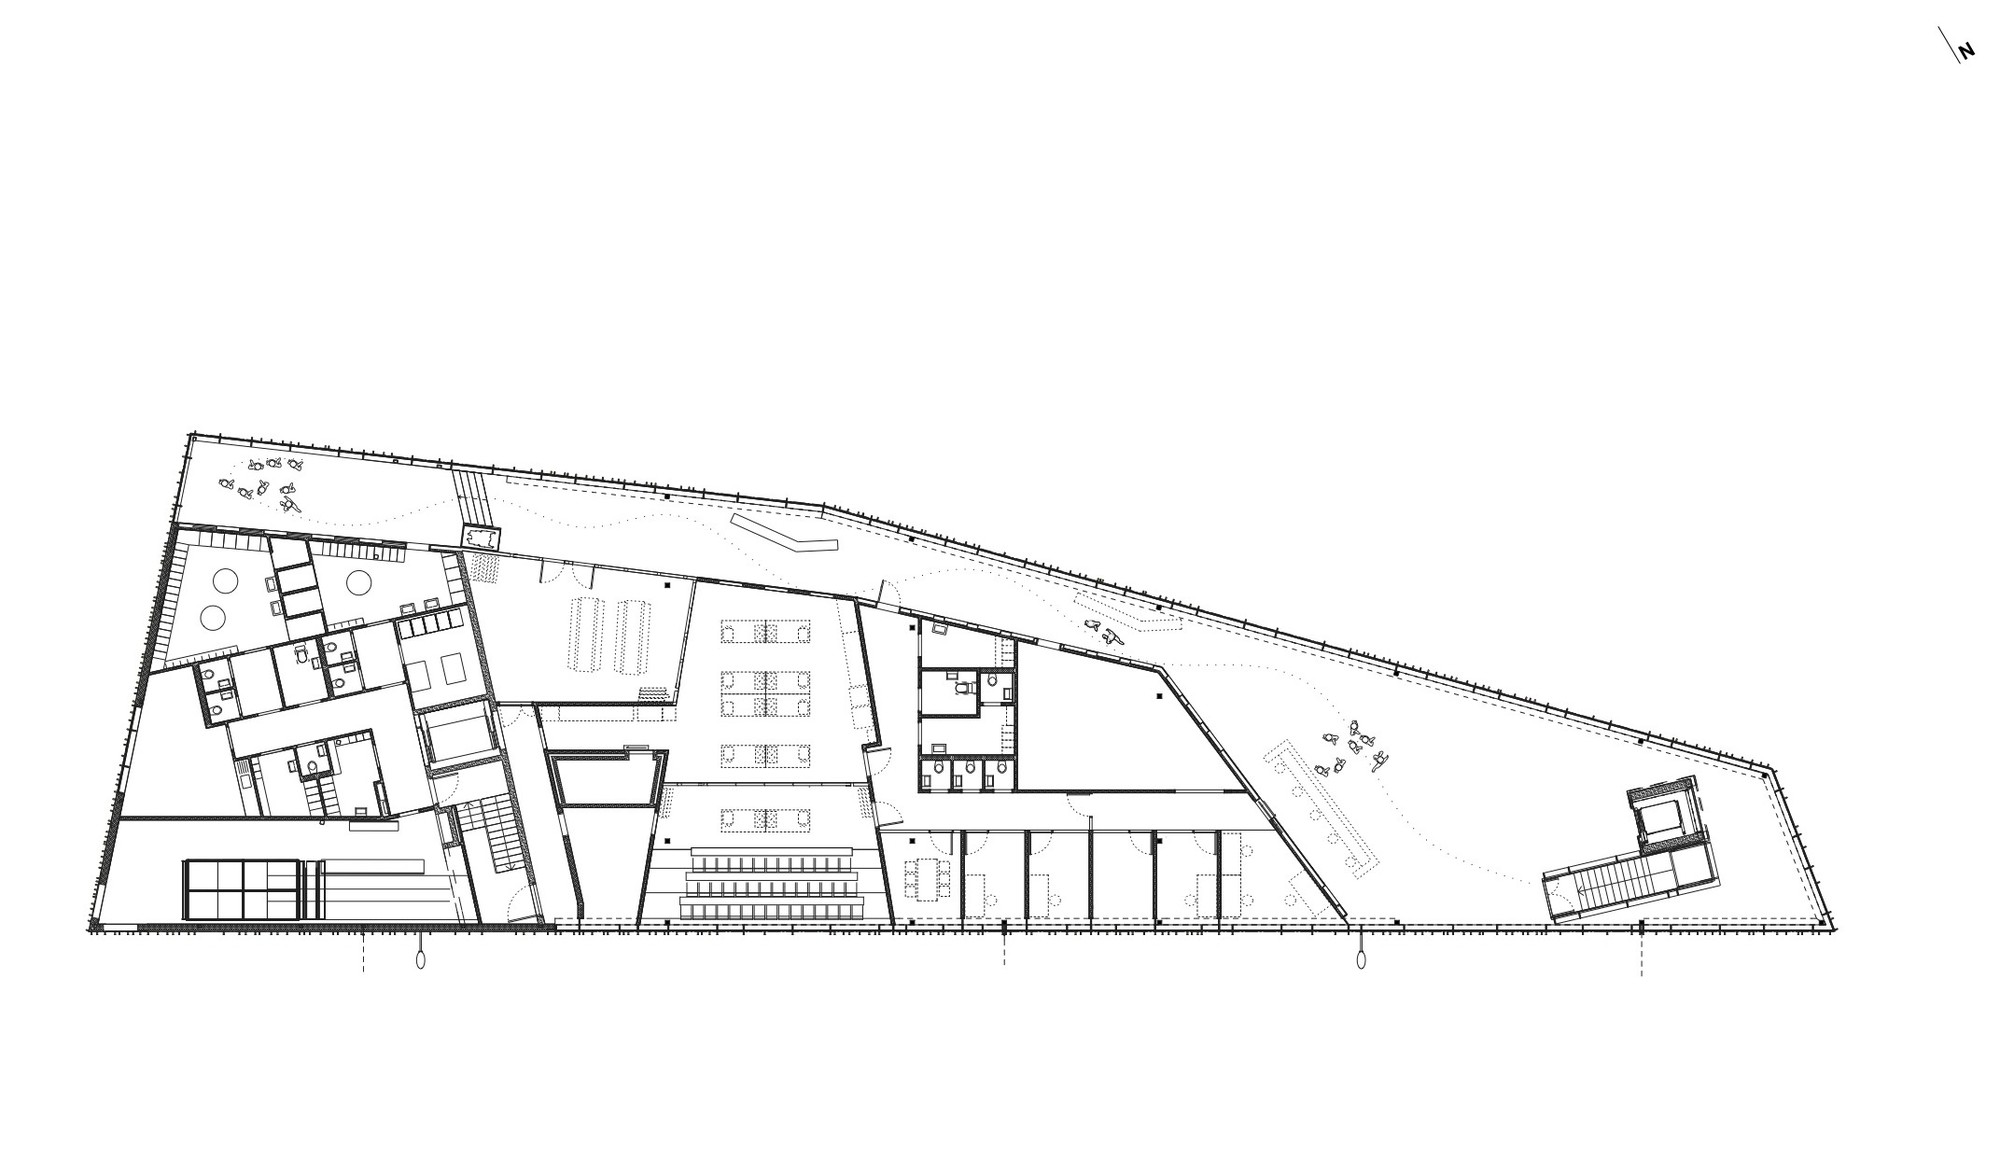 Boat Floor Plans Gallery Of Fish Market In Bergen Eder Biesel Arkitekter 21